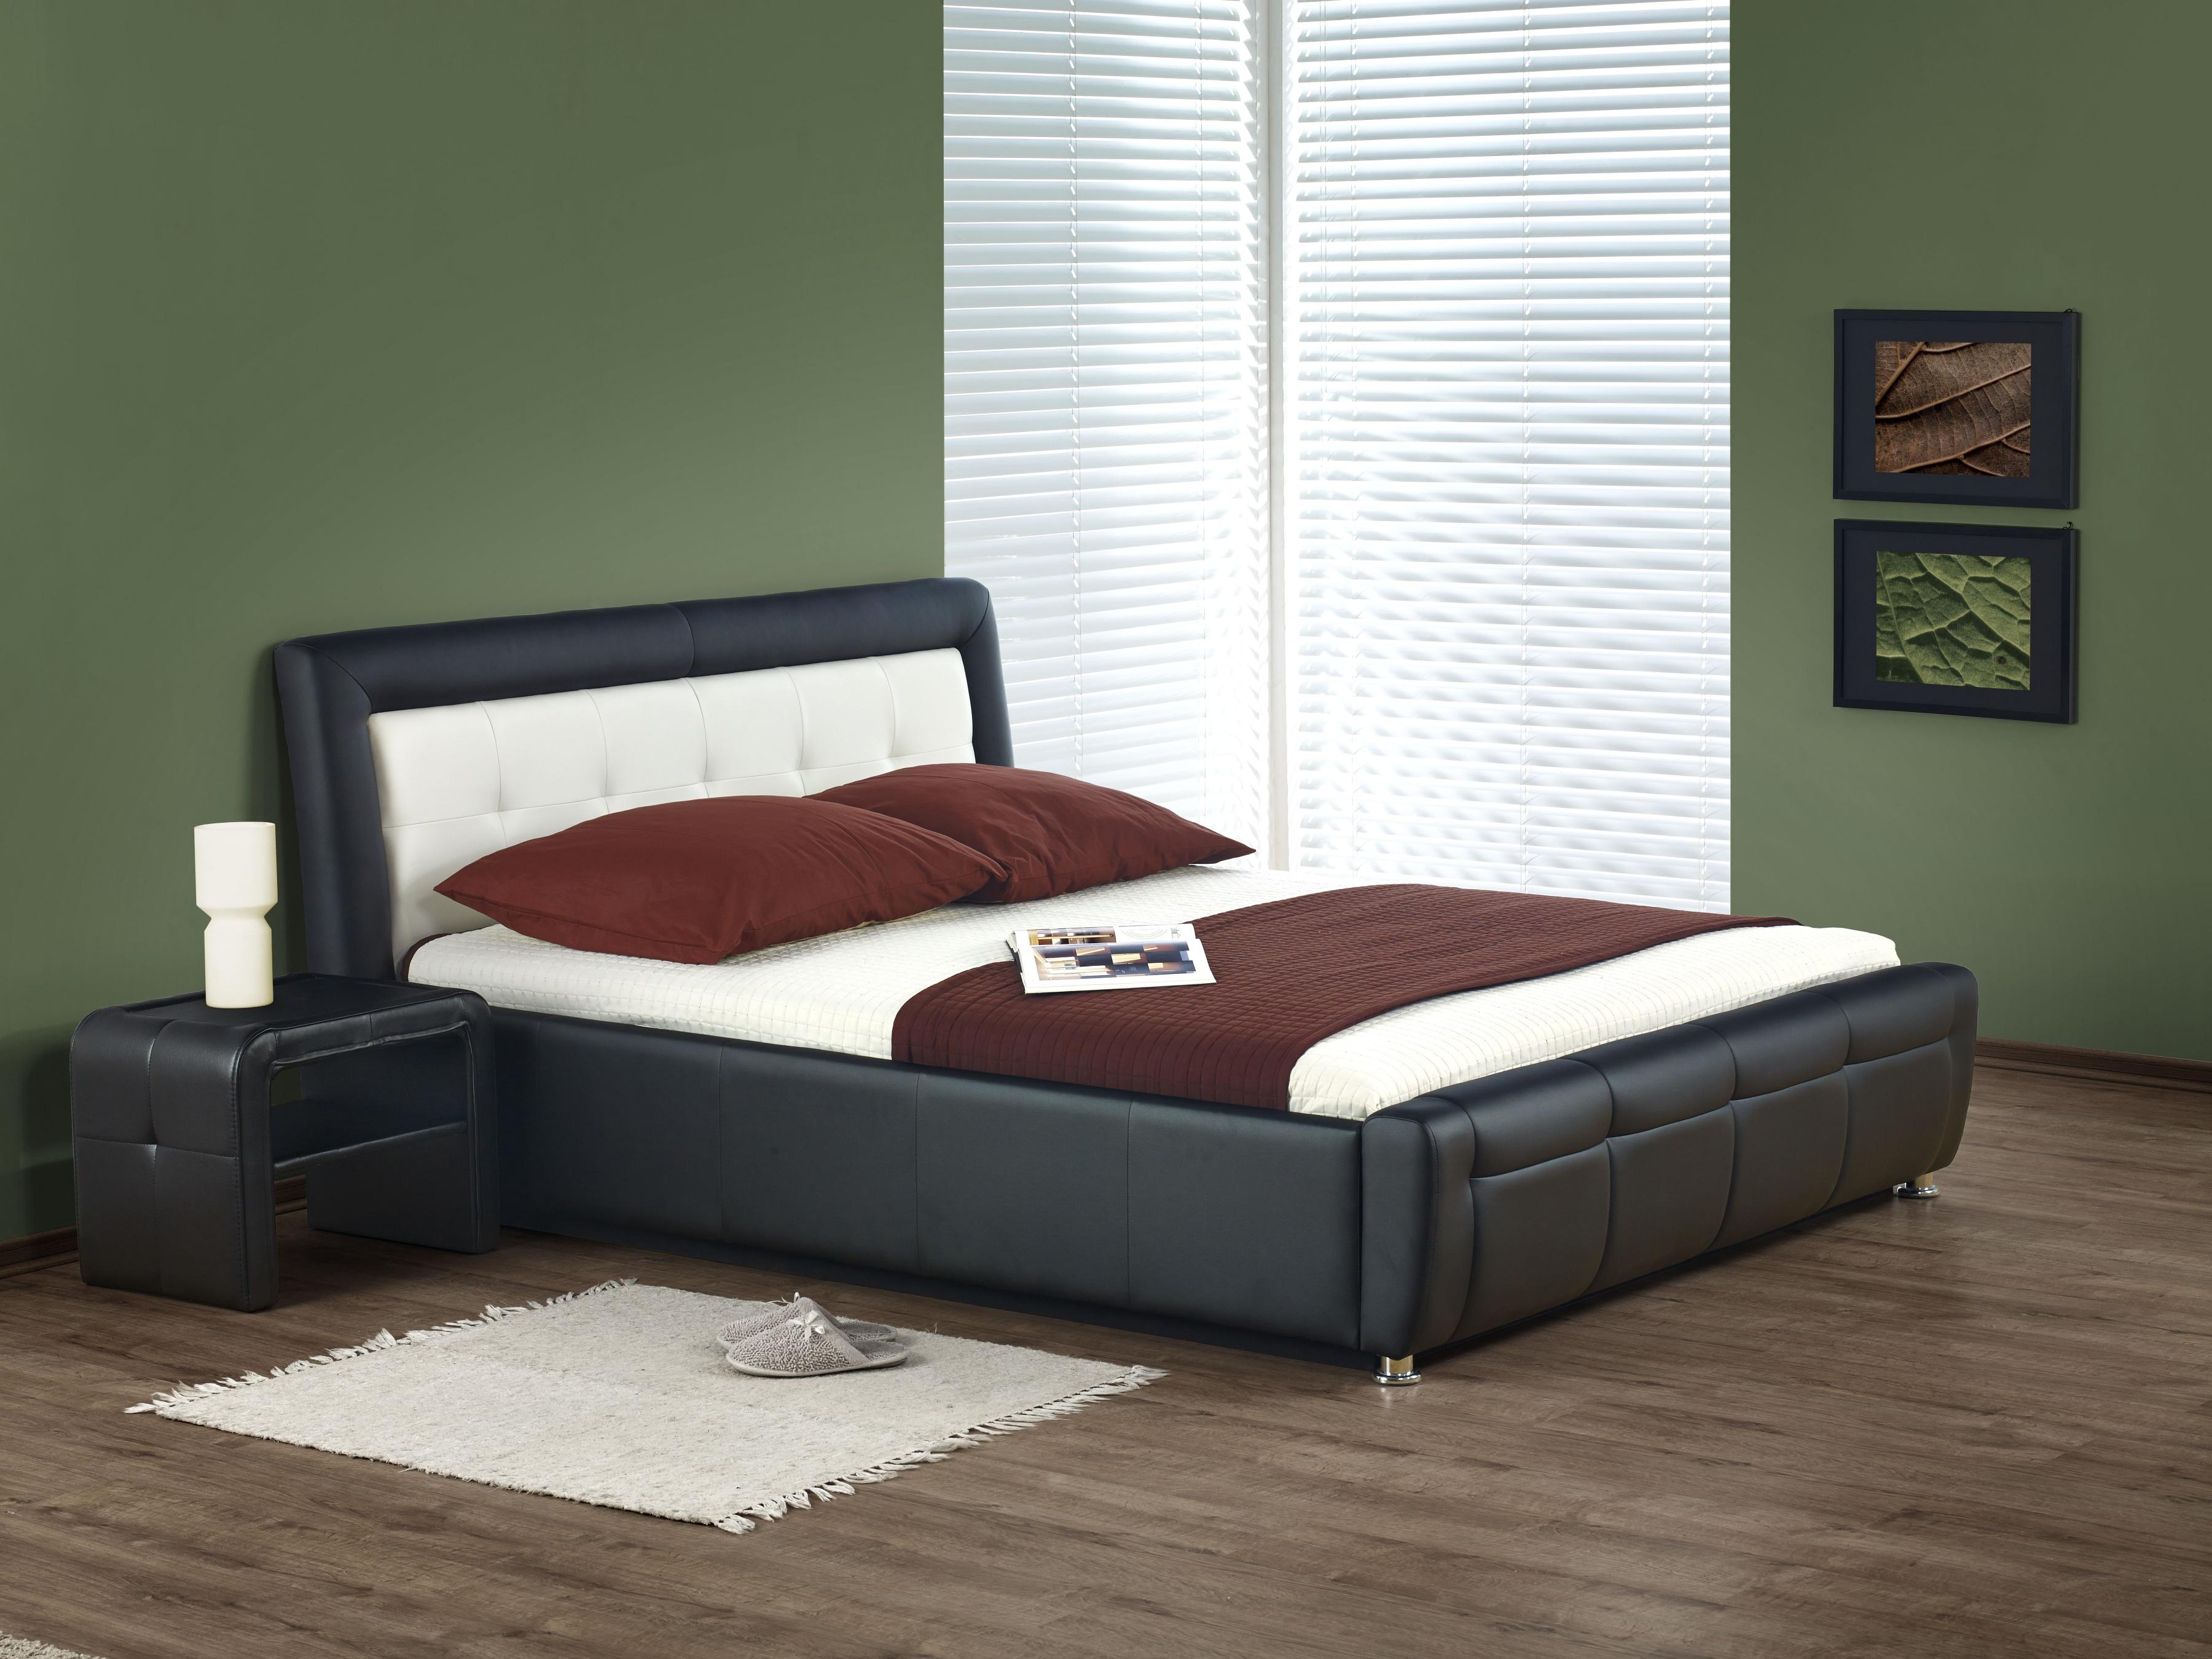 Manželská postel 160 cm - Halmar - SAMANTA P (s roštem a úložným prostorem)